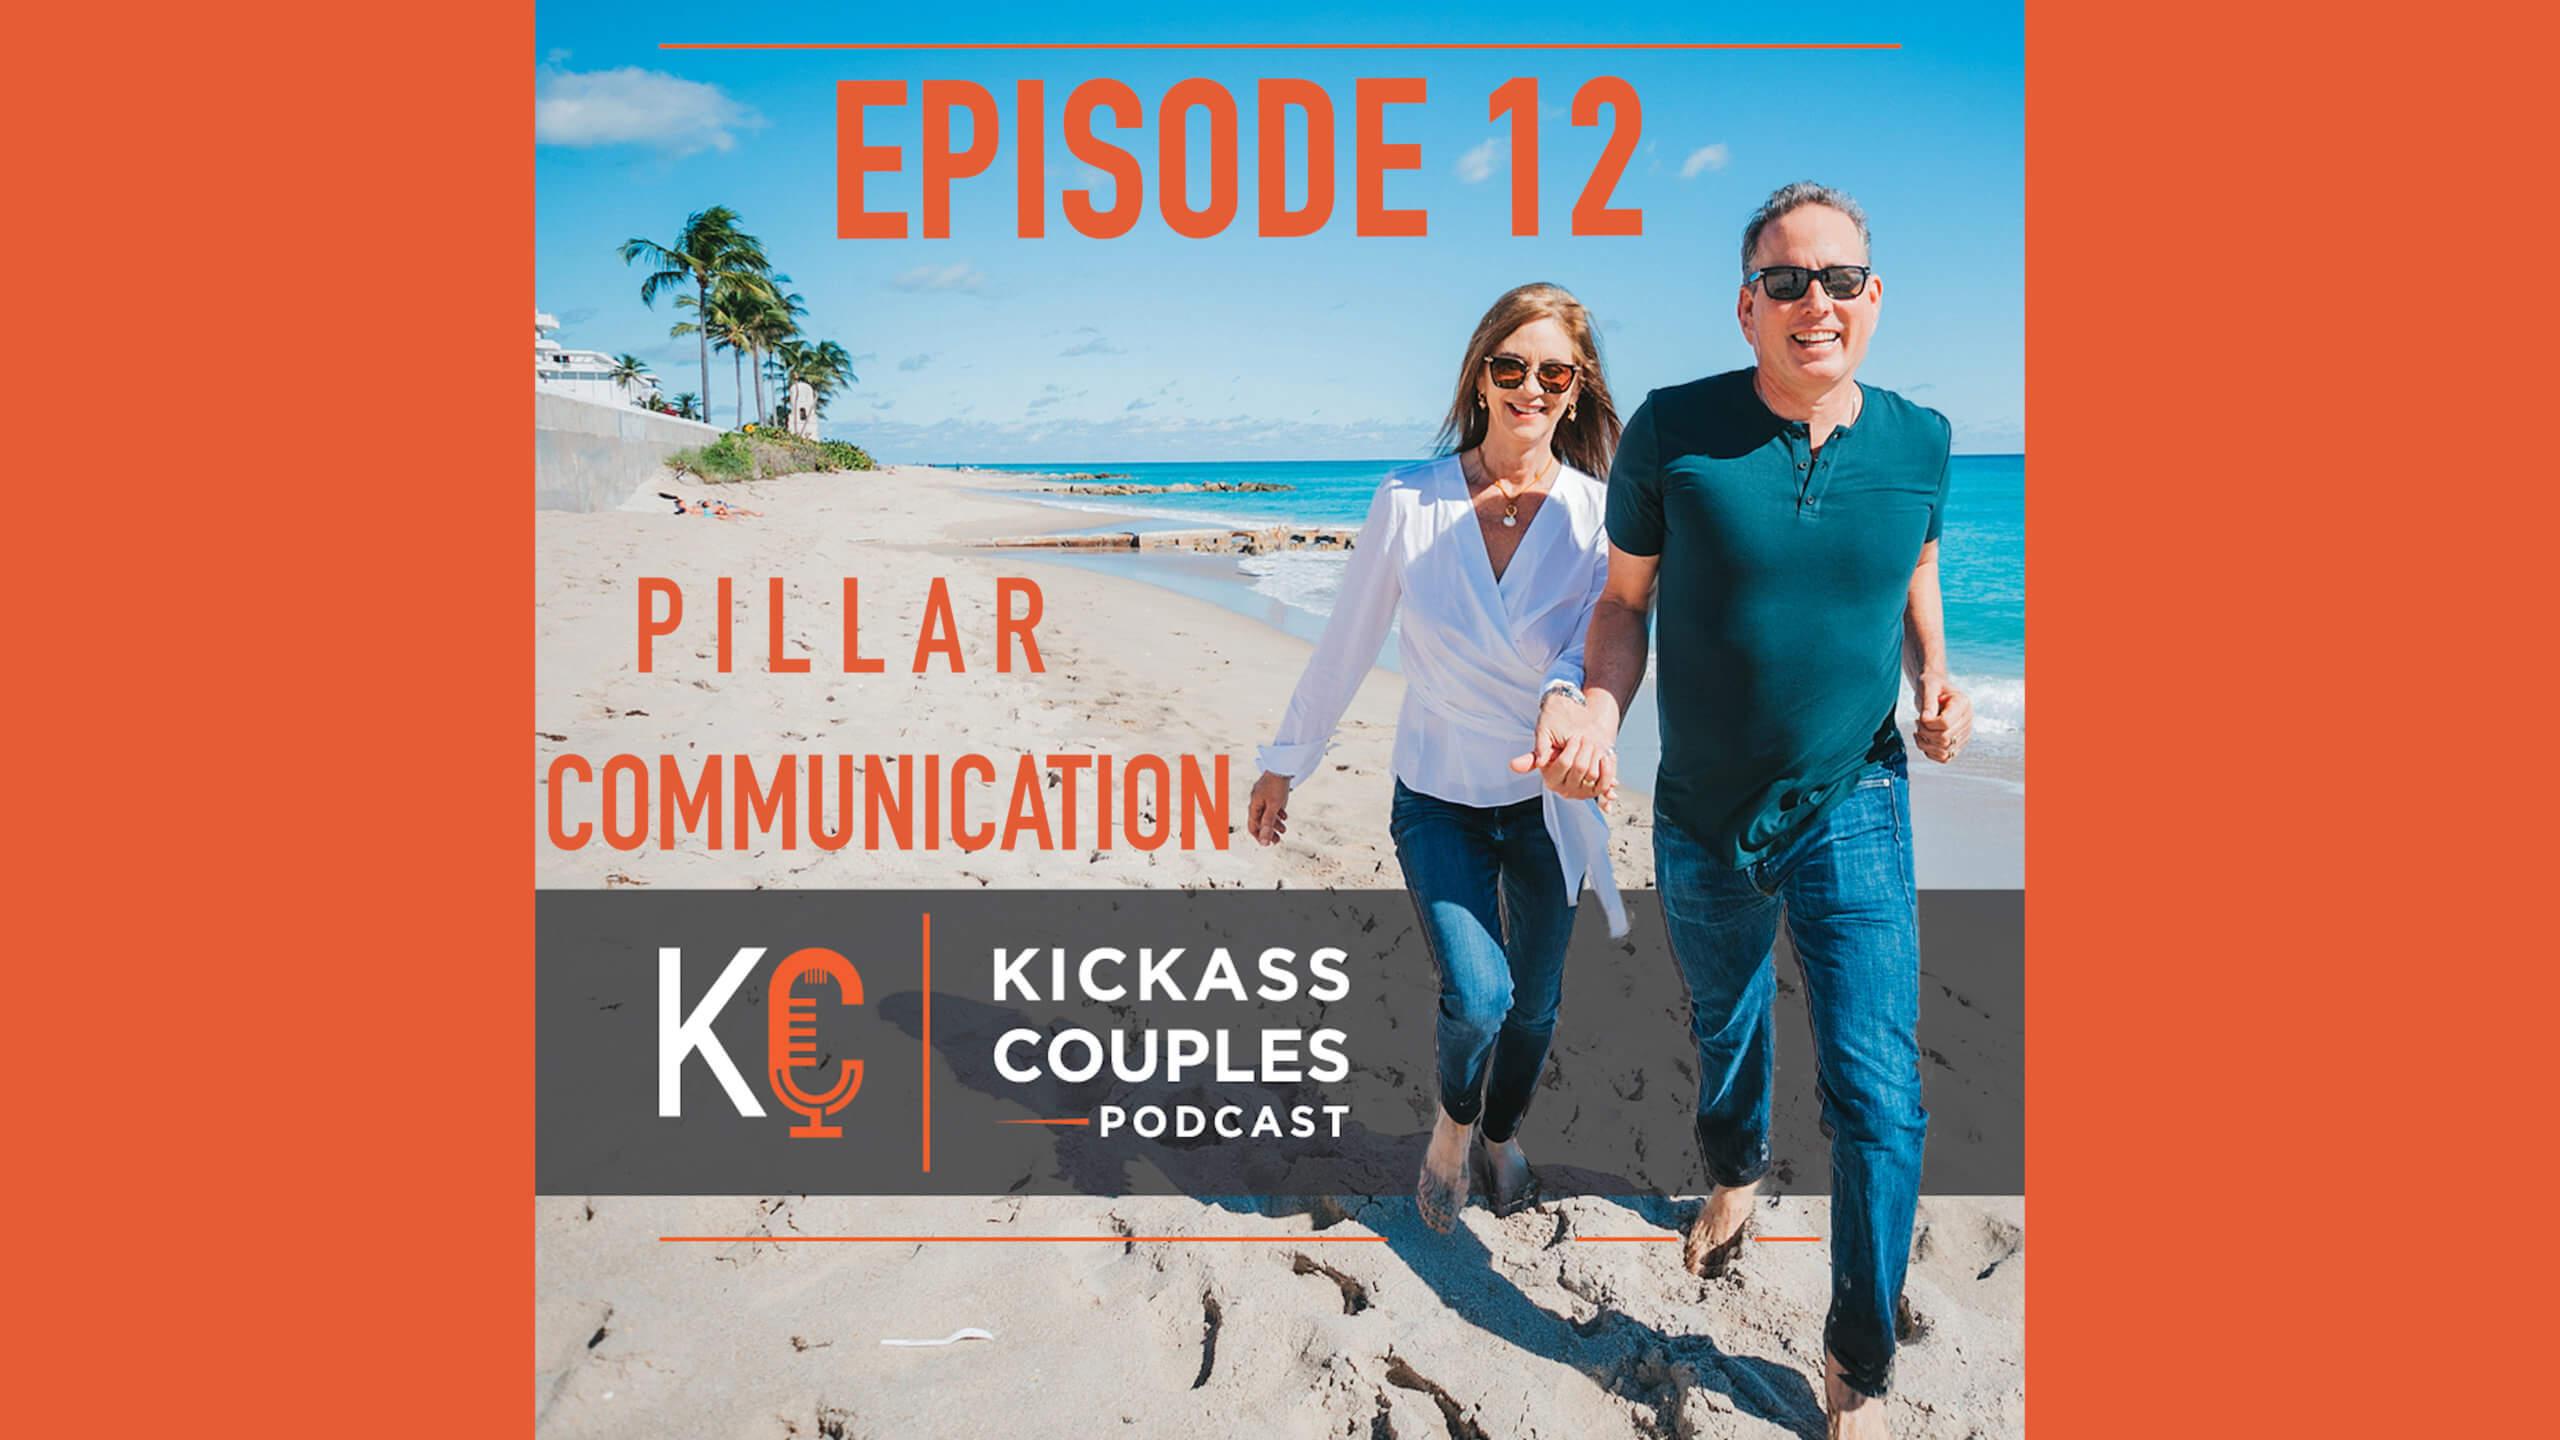 Episode 12: Pillar Communication